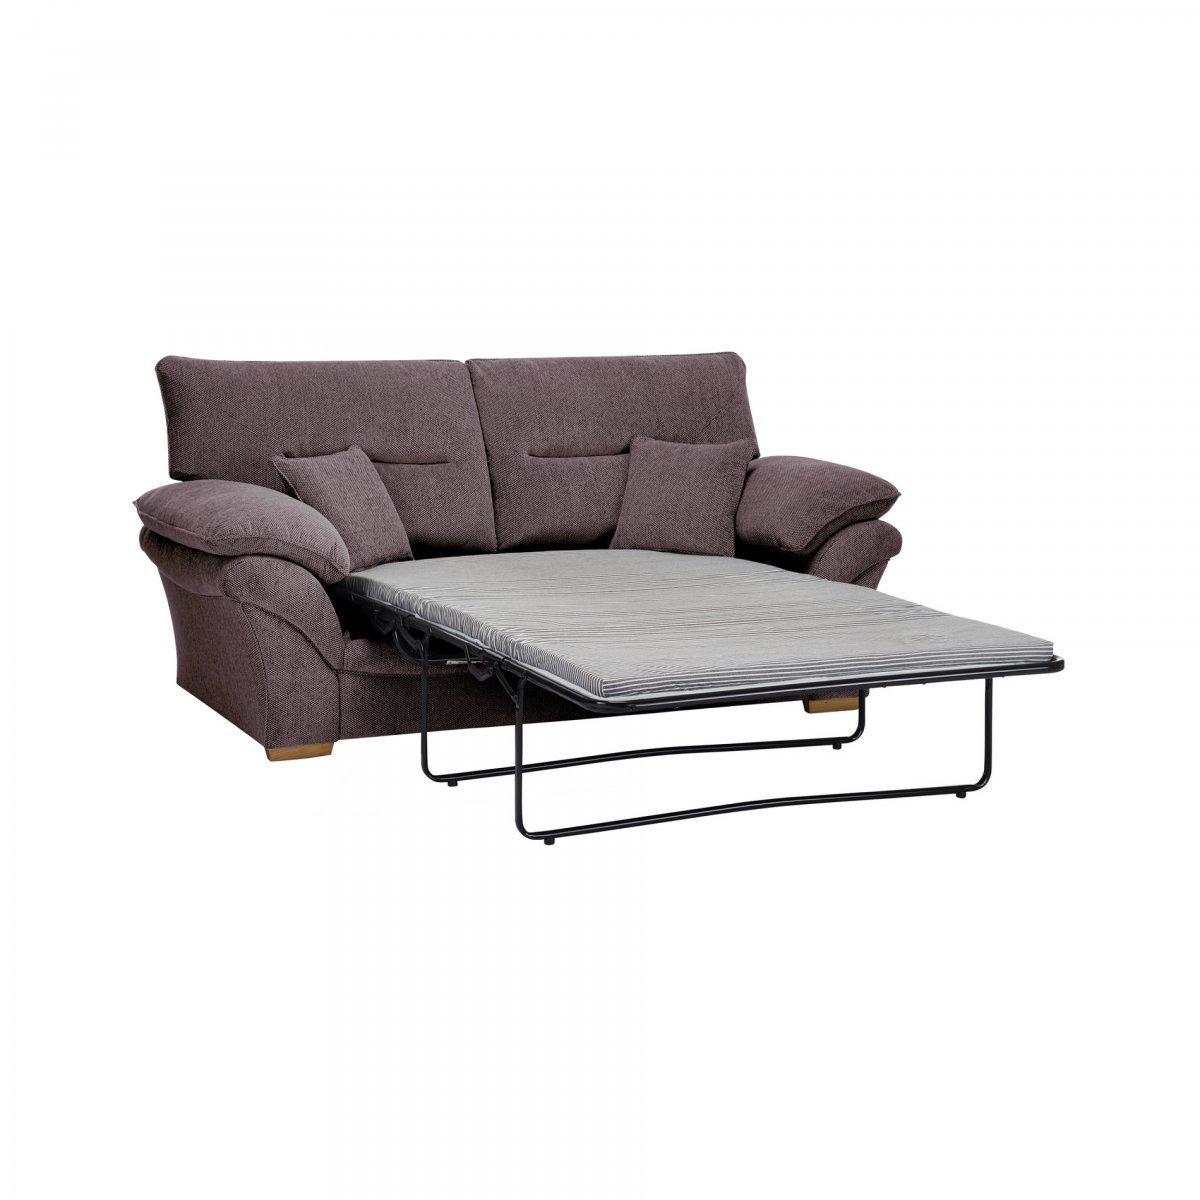 standard sofa cushion size nice sofascore chloe 2 seater bed in logan grey fabric